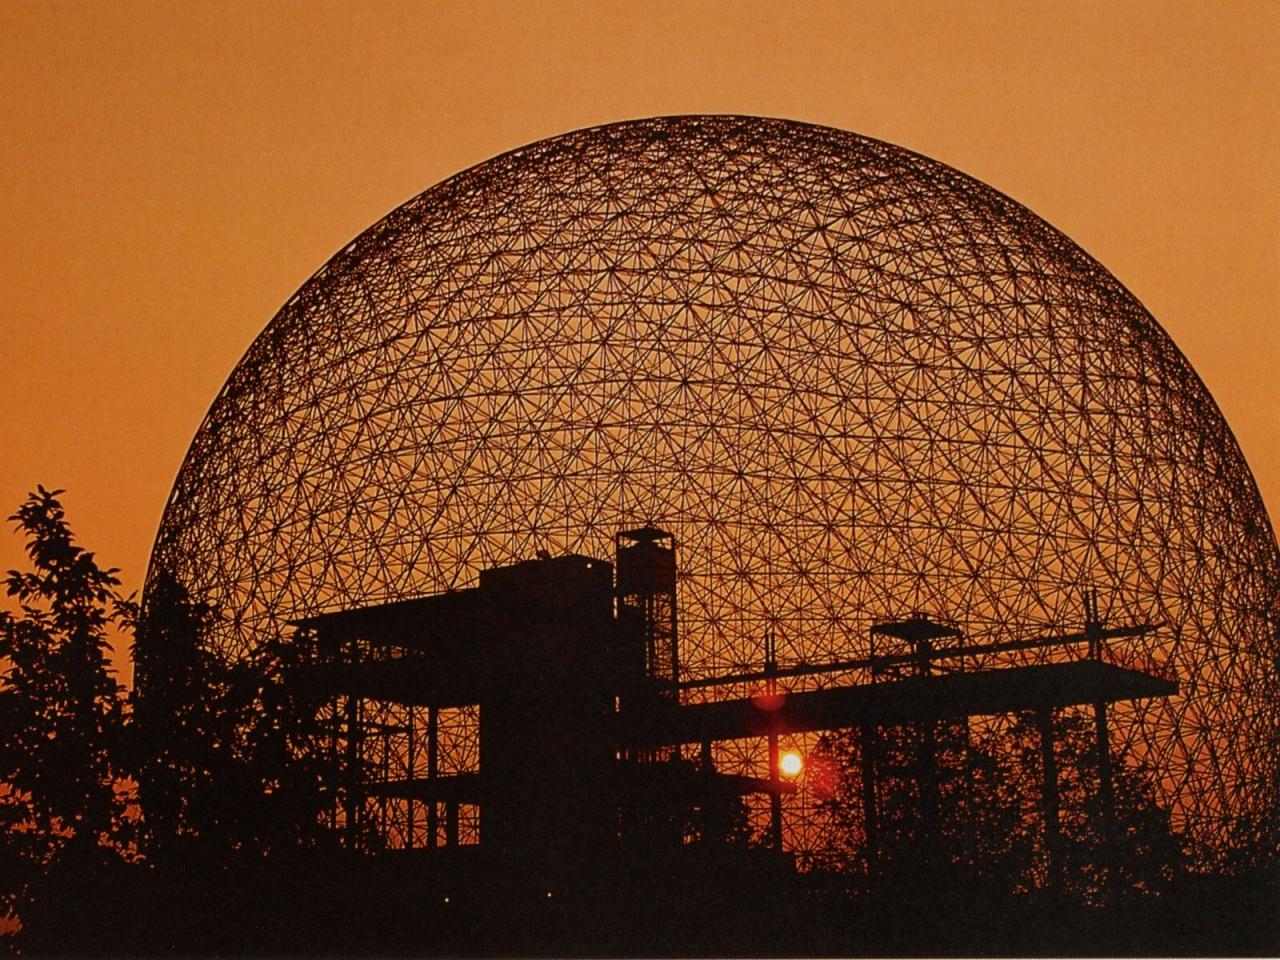 Montreal Expo 67 Biosphere 1600 WallpaperSuggestcom wallpapers 1280x960